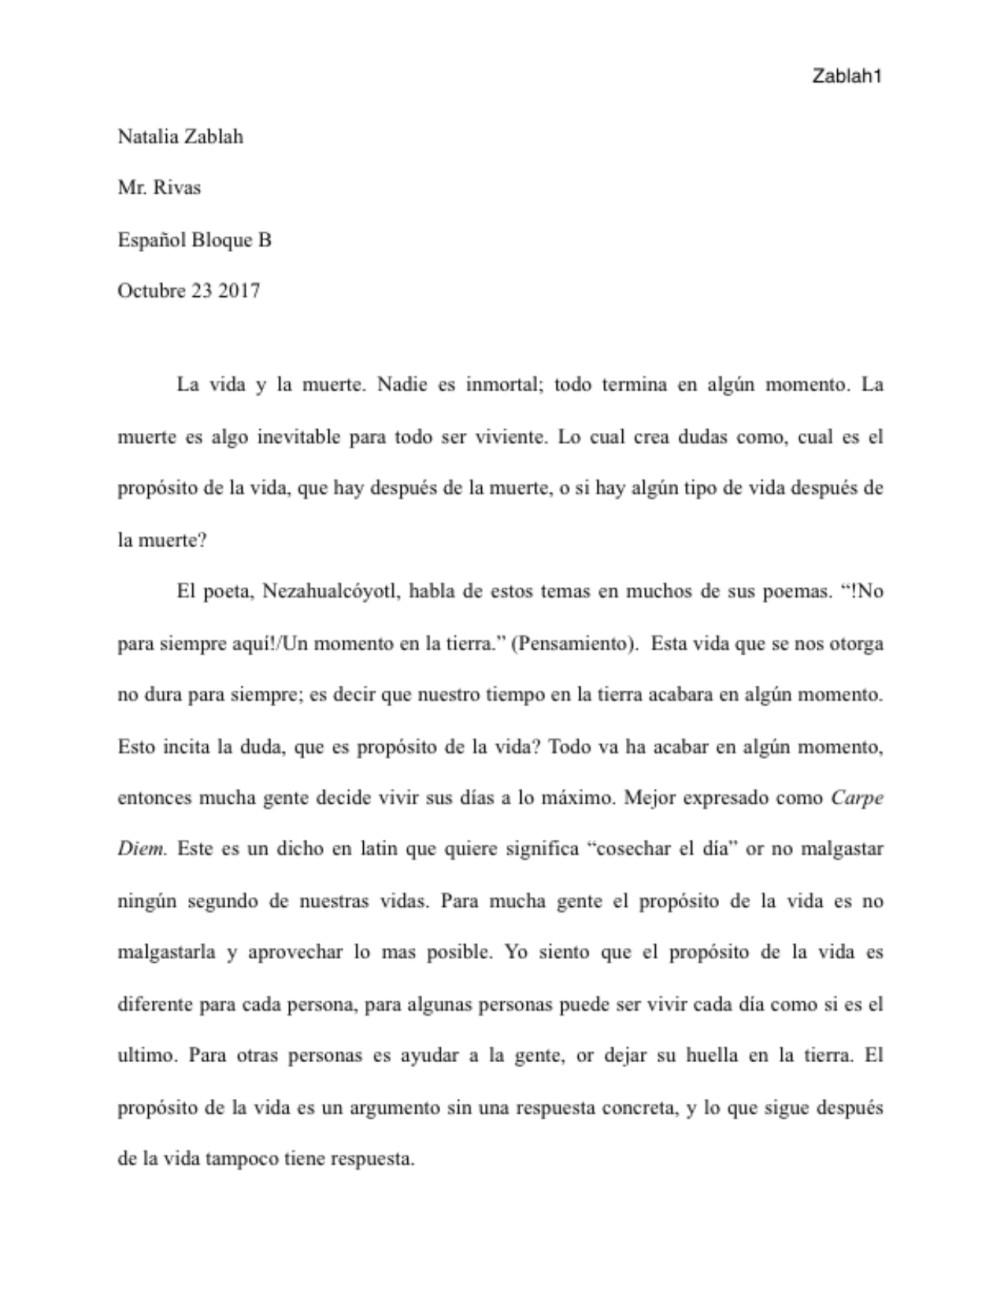 Translate From Spanish To English By Natzablah